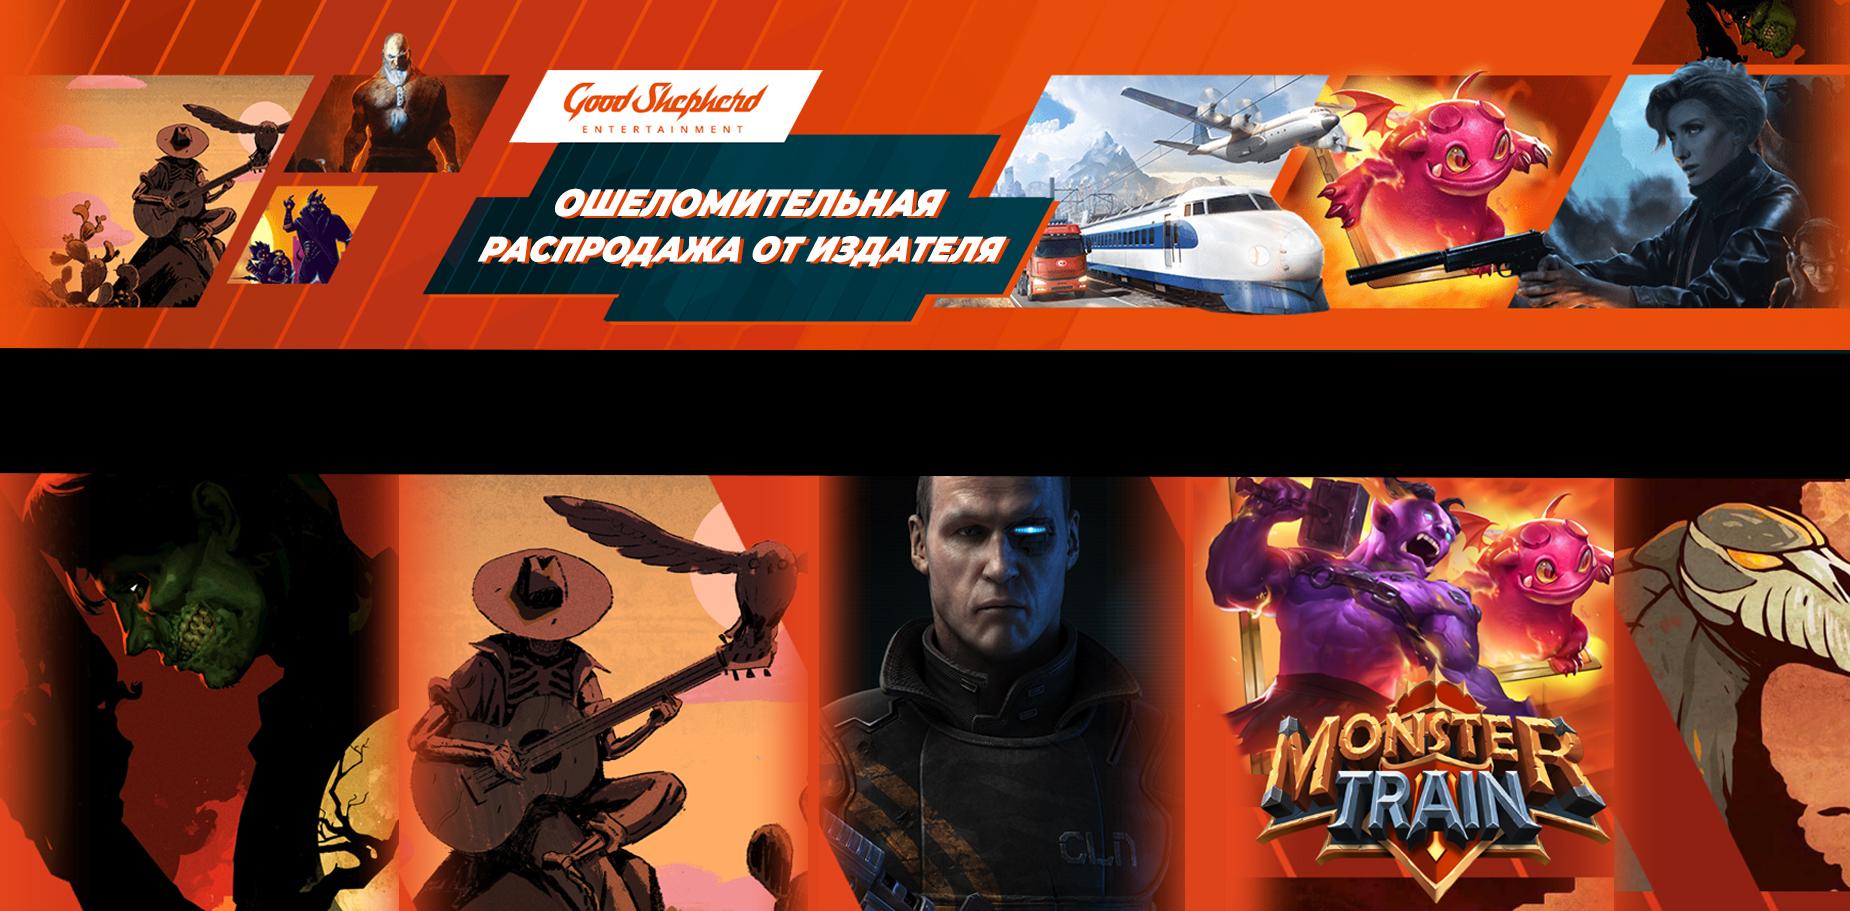 В Steam стартовала распродажа издателя Good Shepherd Entertainment